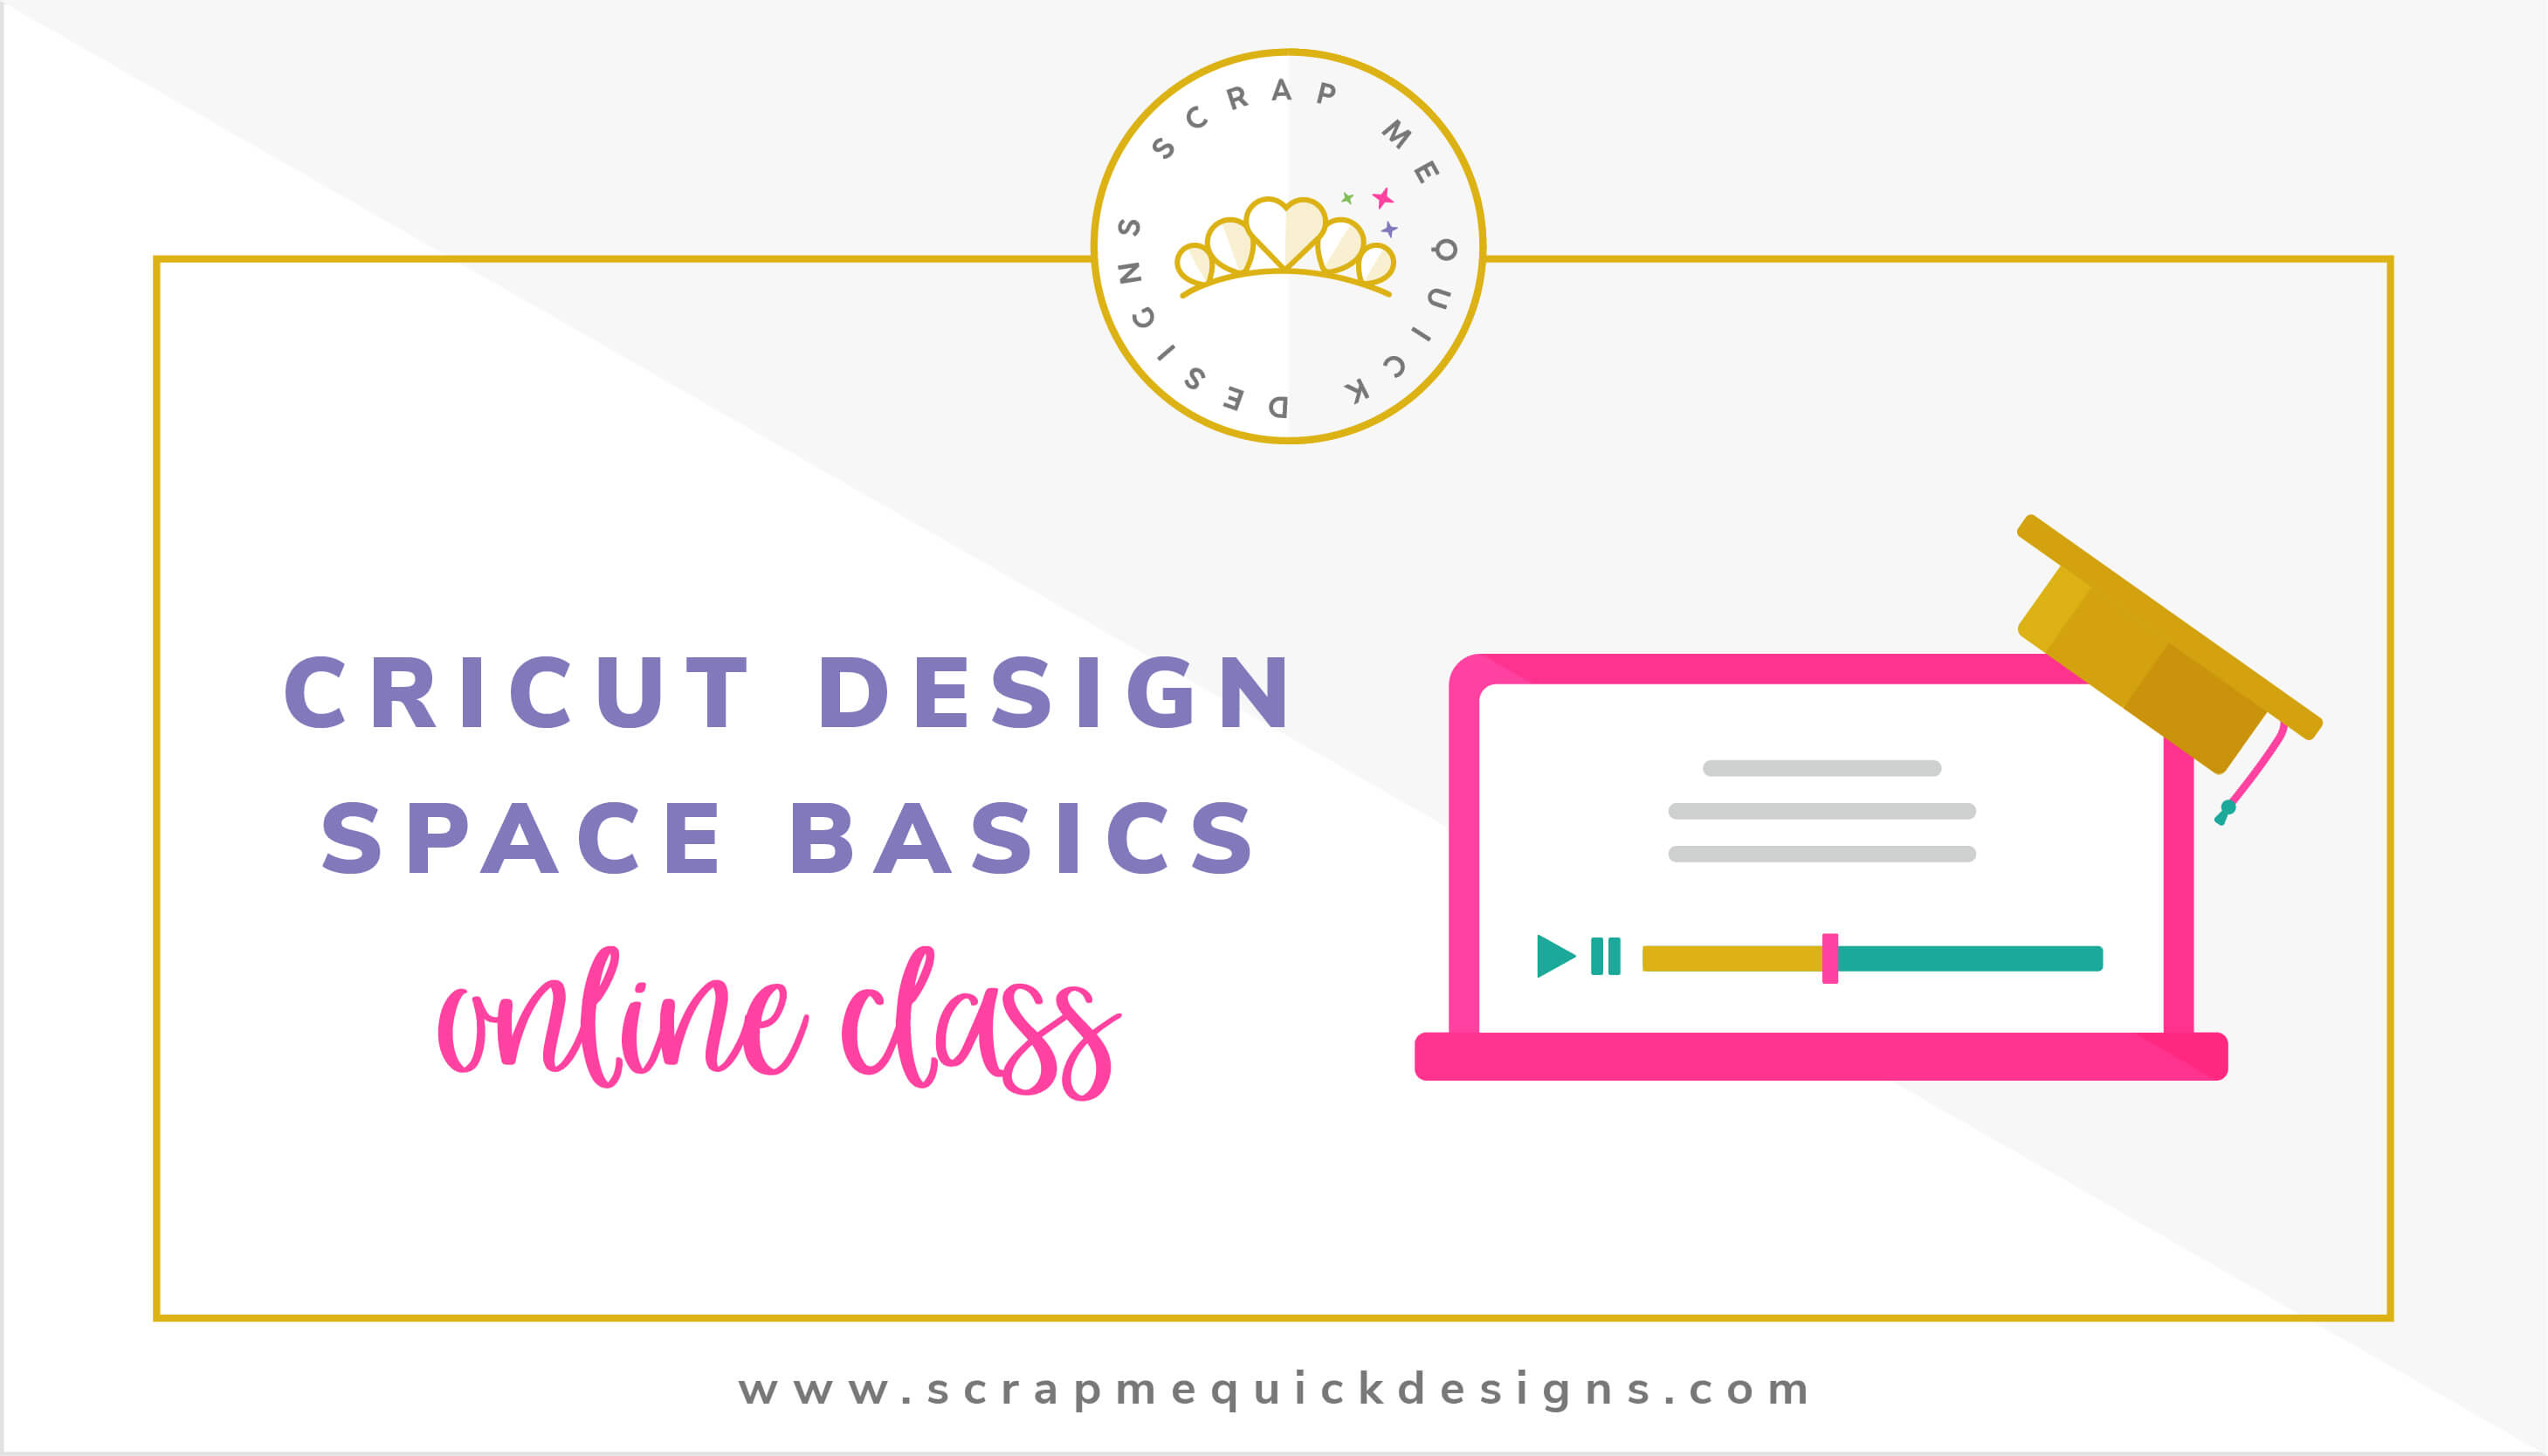 Cricut Design Space 3 Online Class - Scrap Me Quick Designs